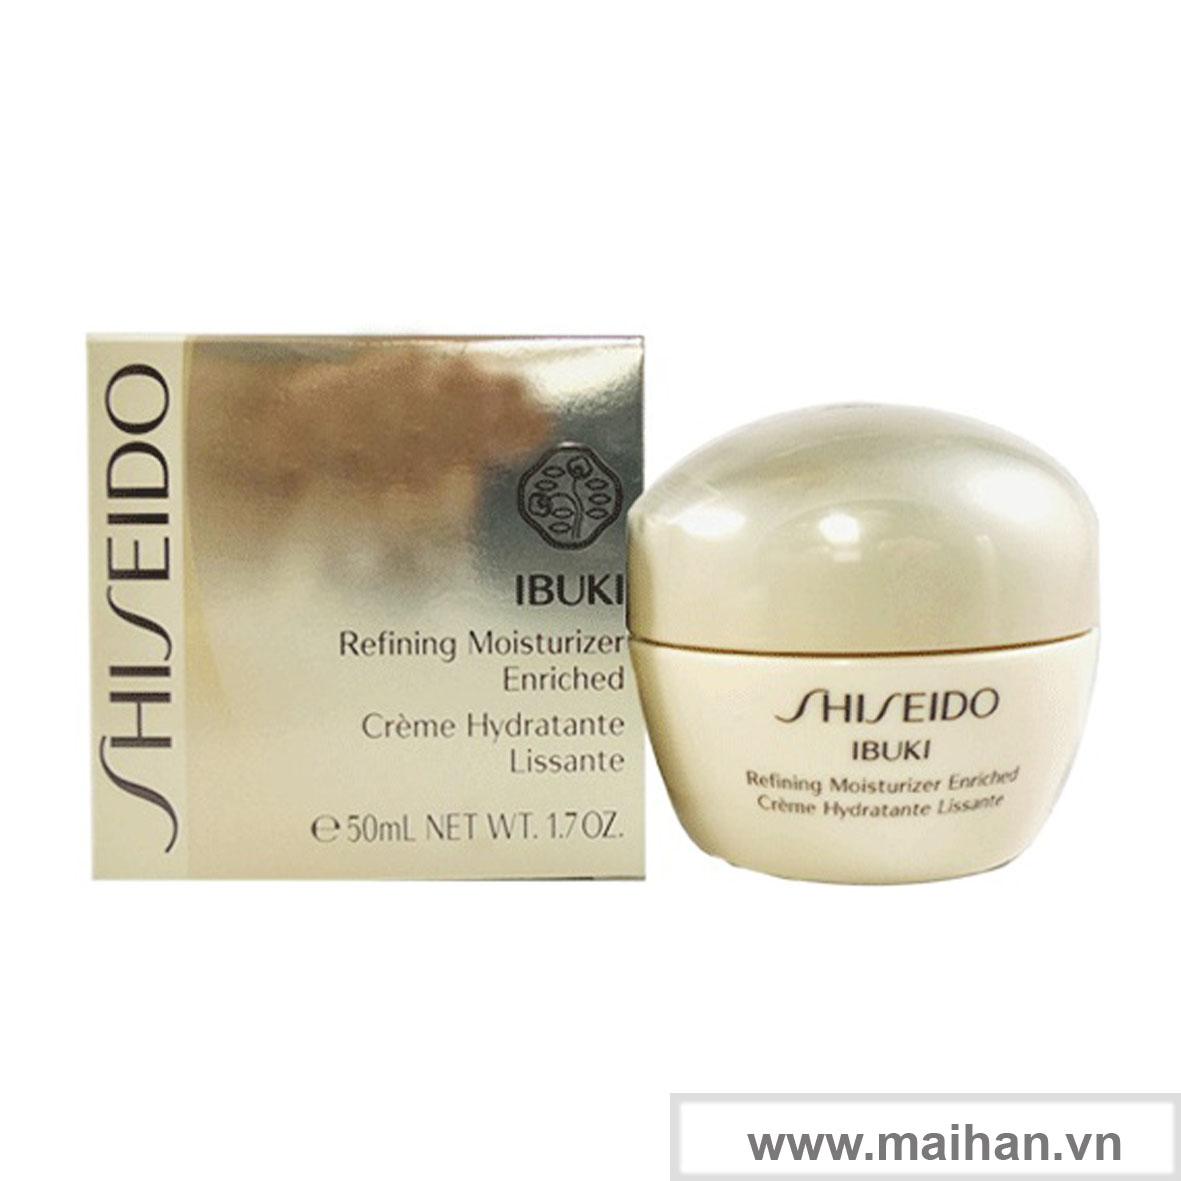 Dưỡng ẩm Shiseido Ibuki Refining Moisturizer Enriched